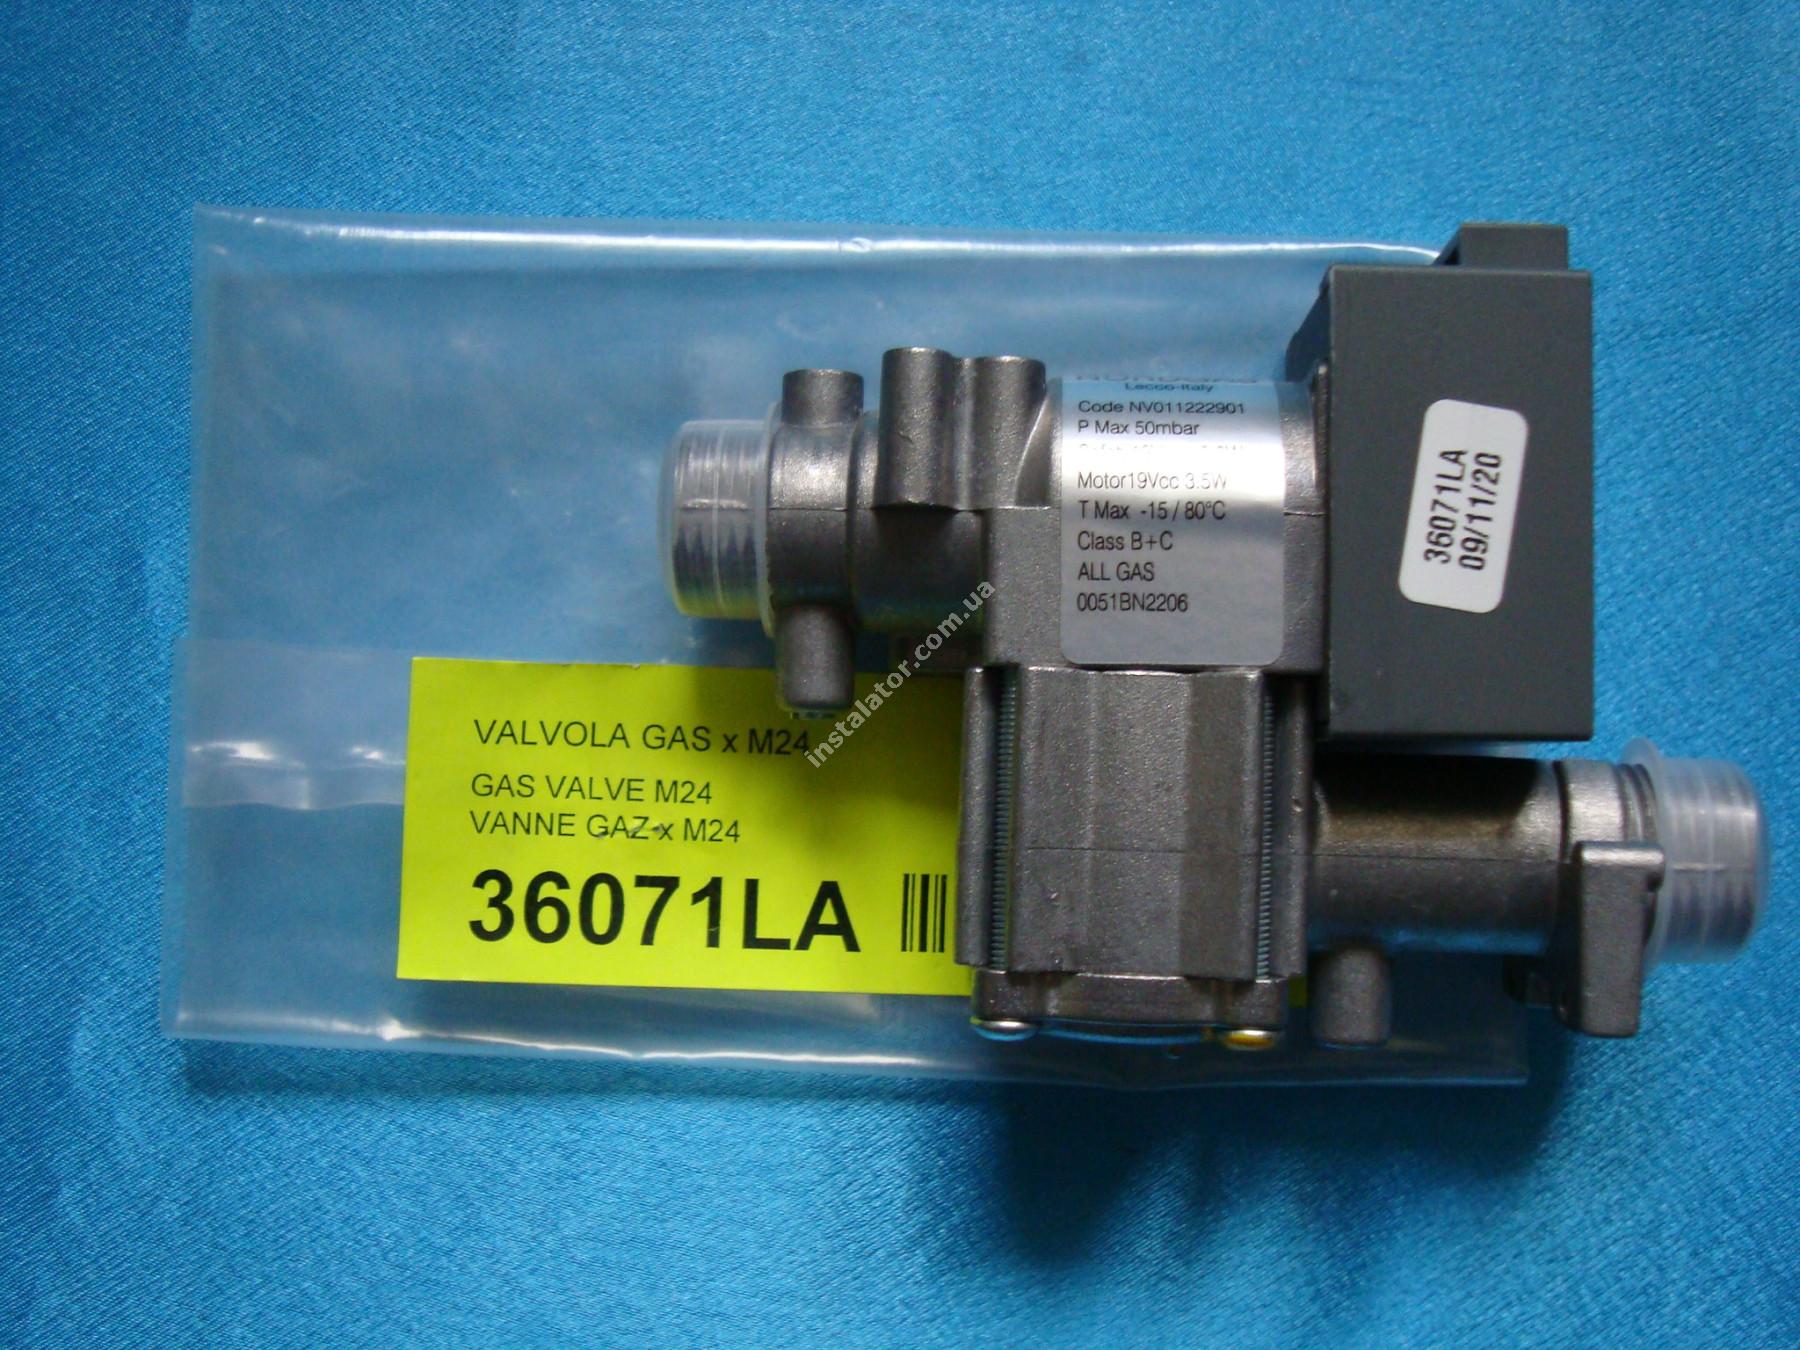 36071LA Газовий клапан Radiant M24 full-image-2